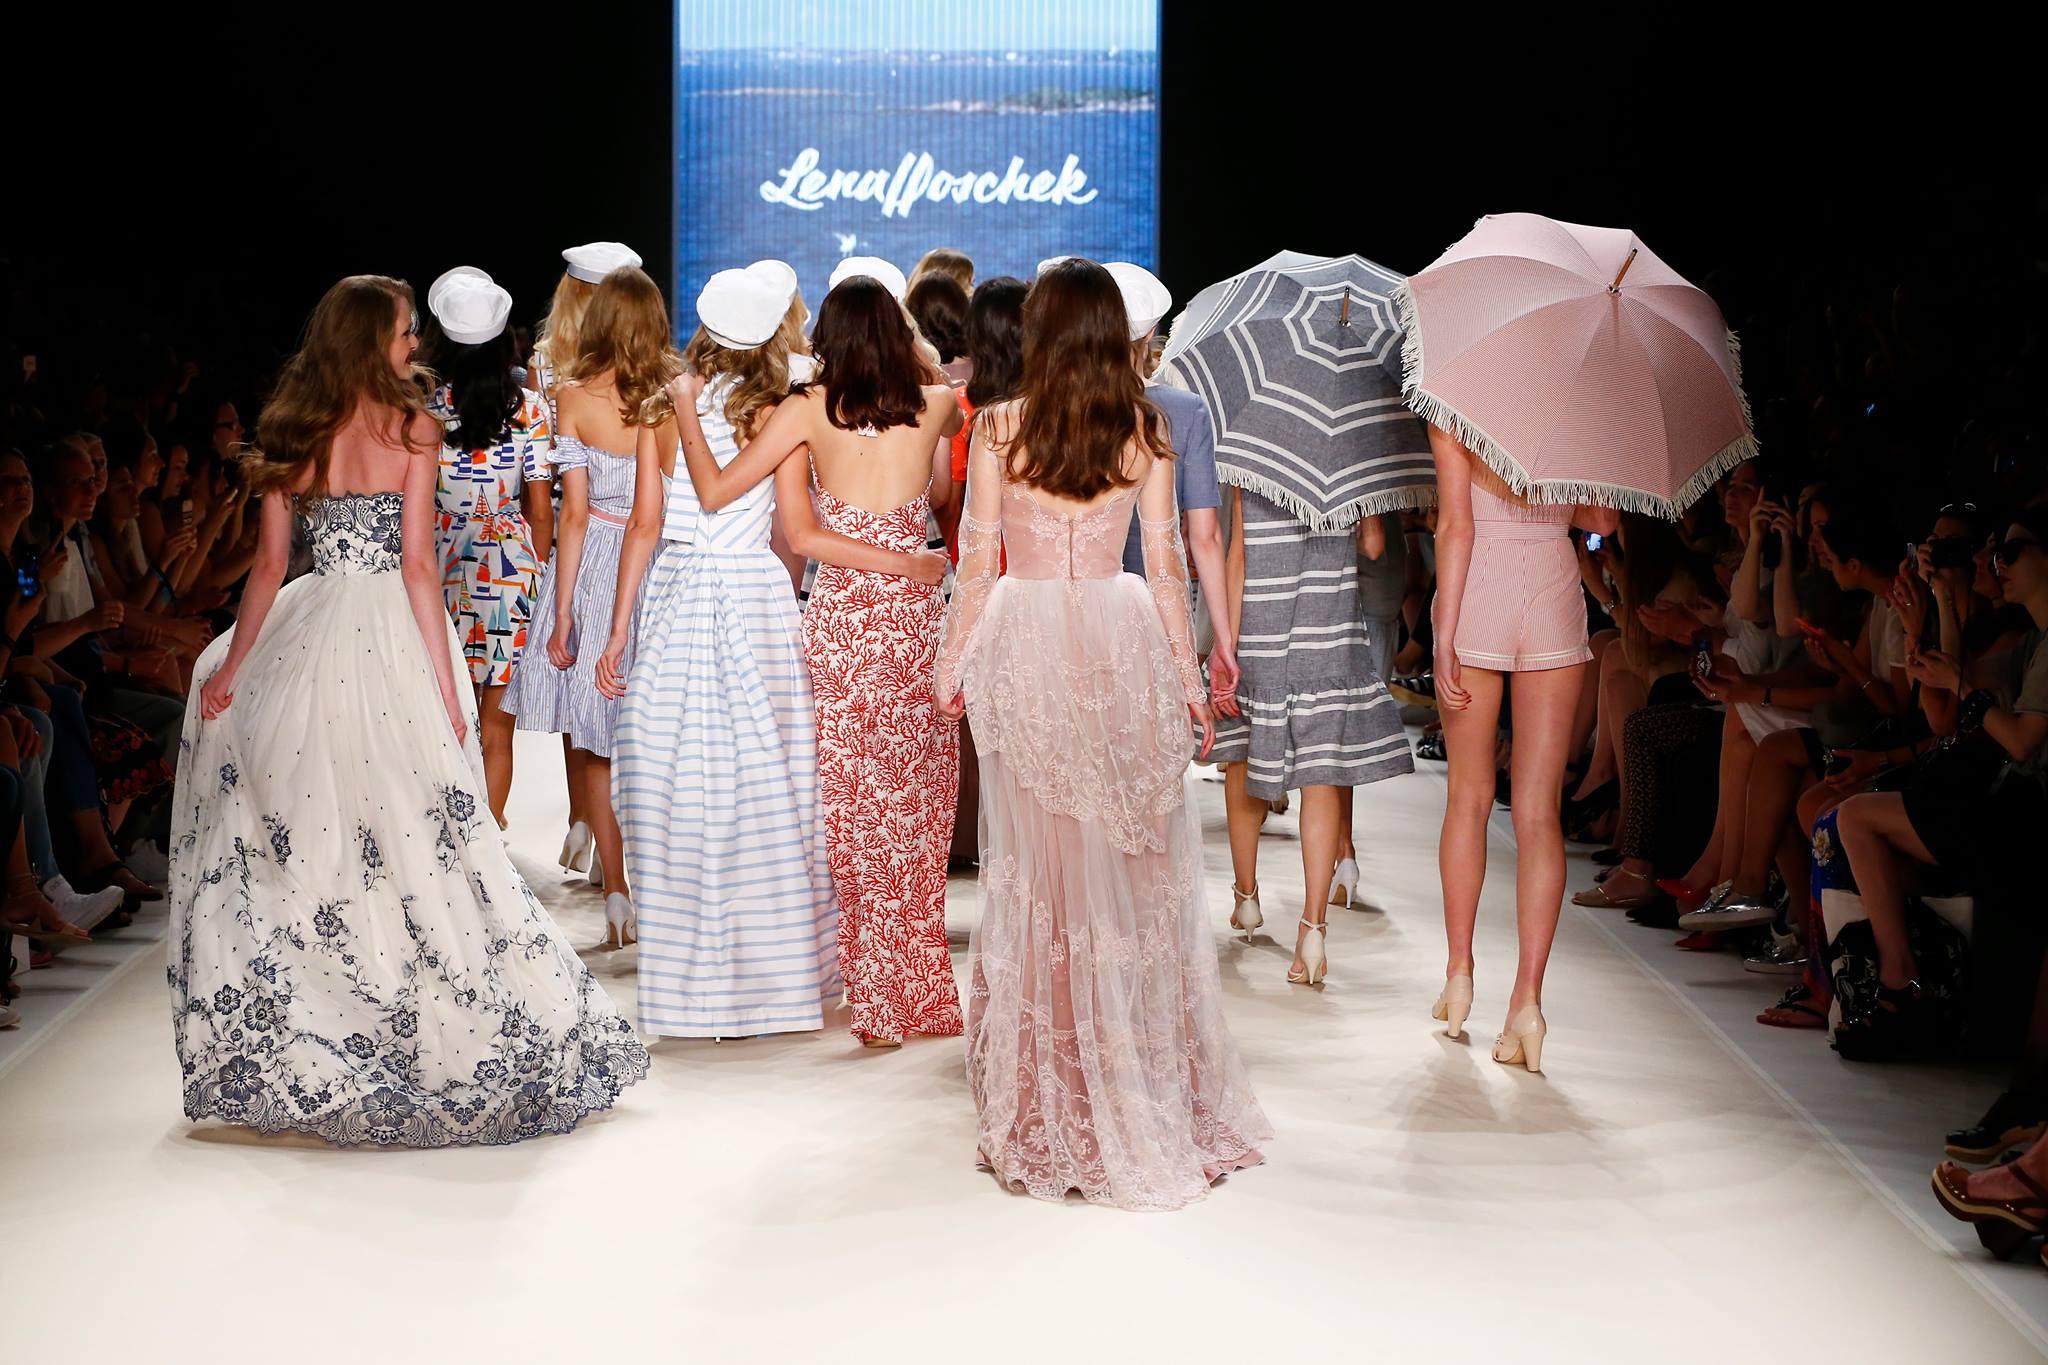 lena-hoschek-berlin-fashion-week-show-2017-runway